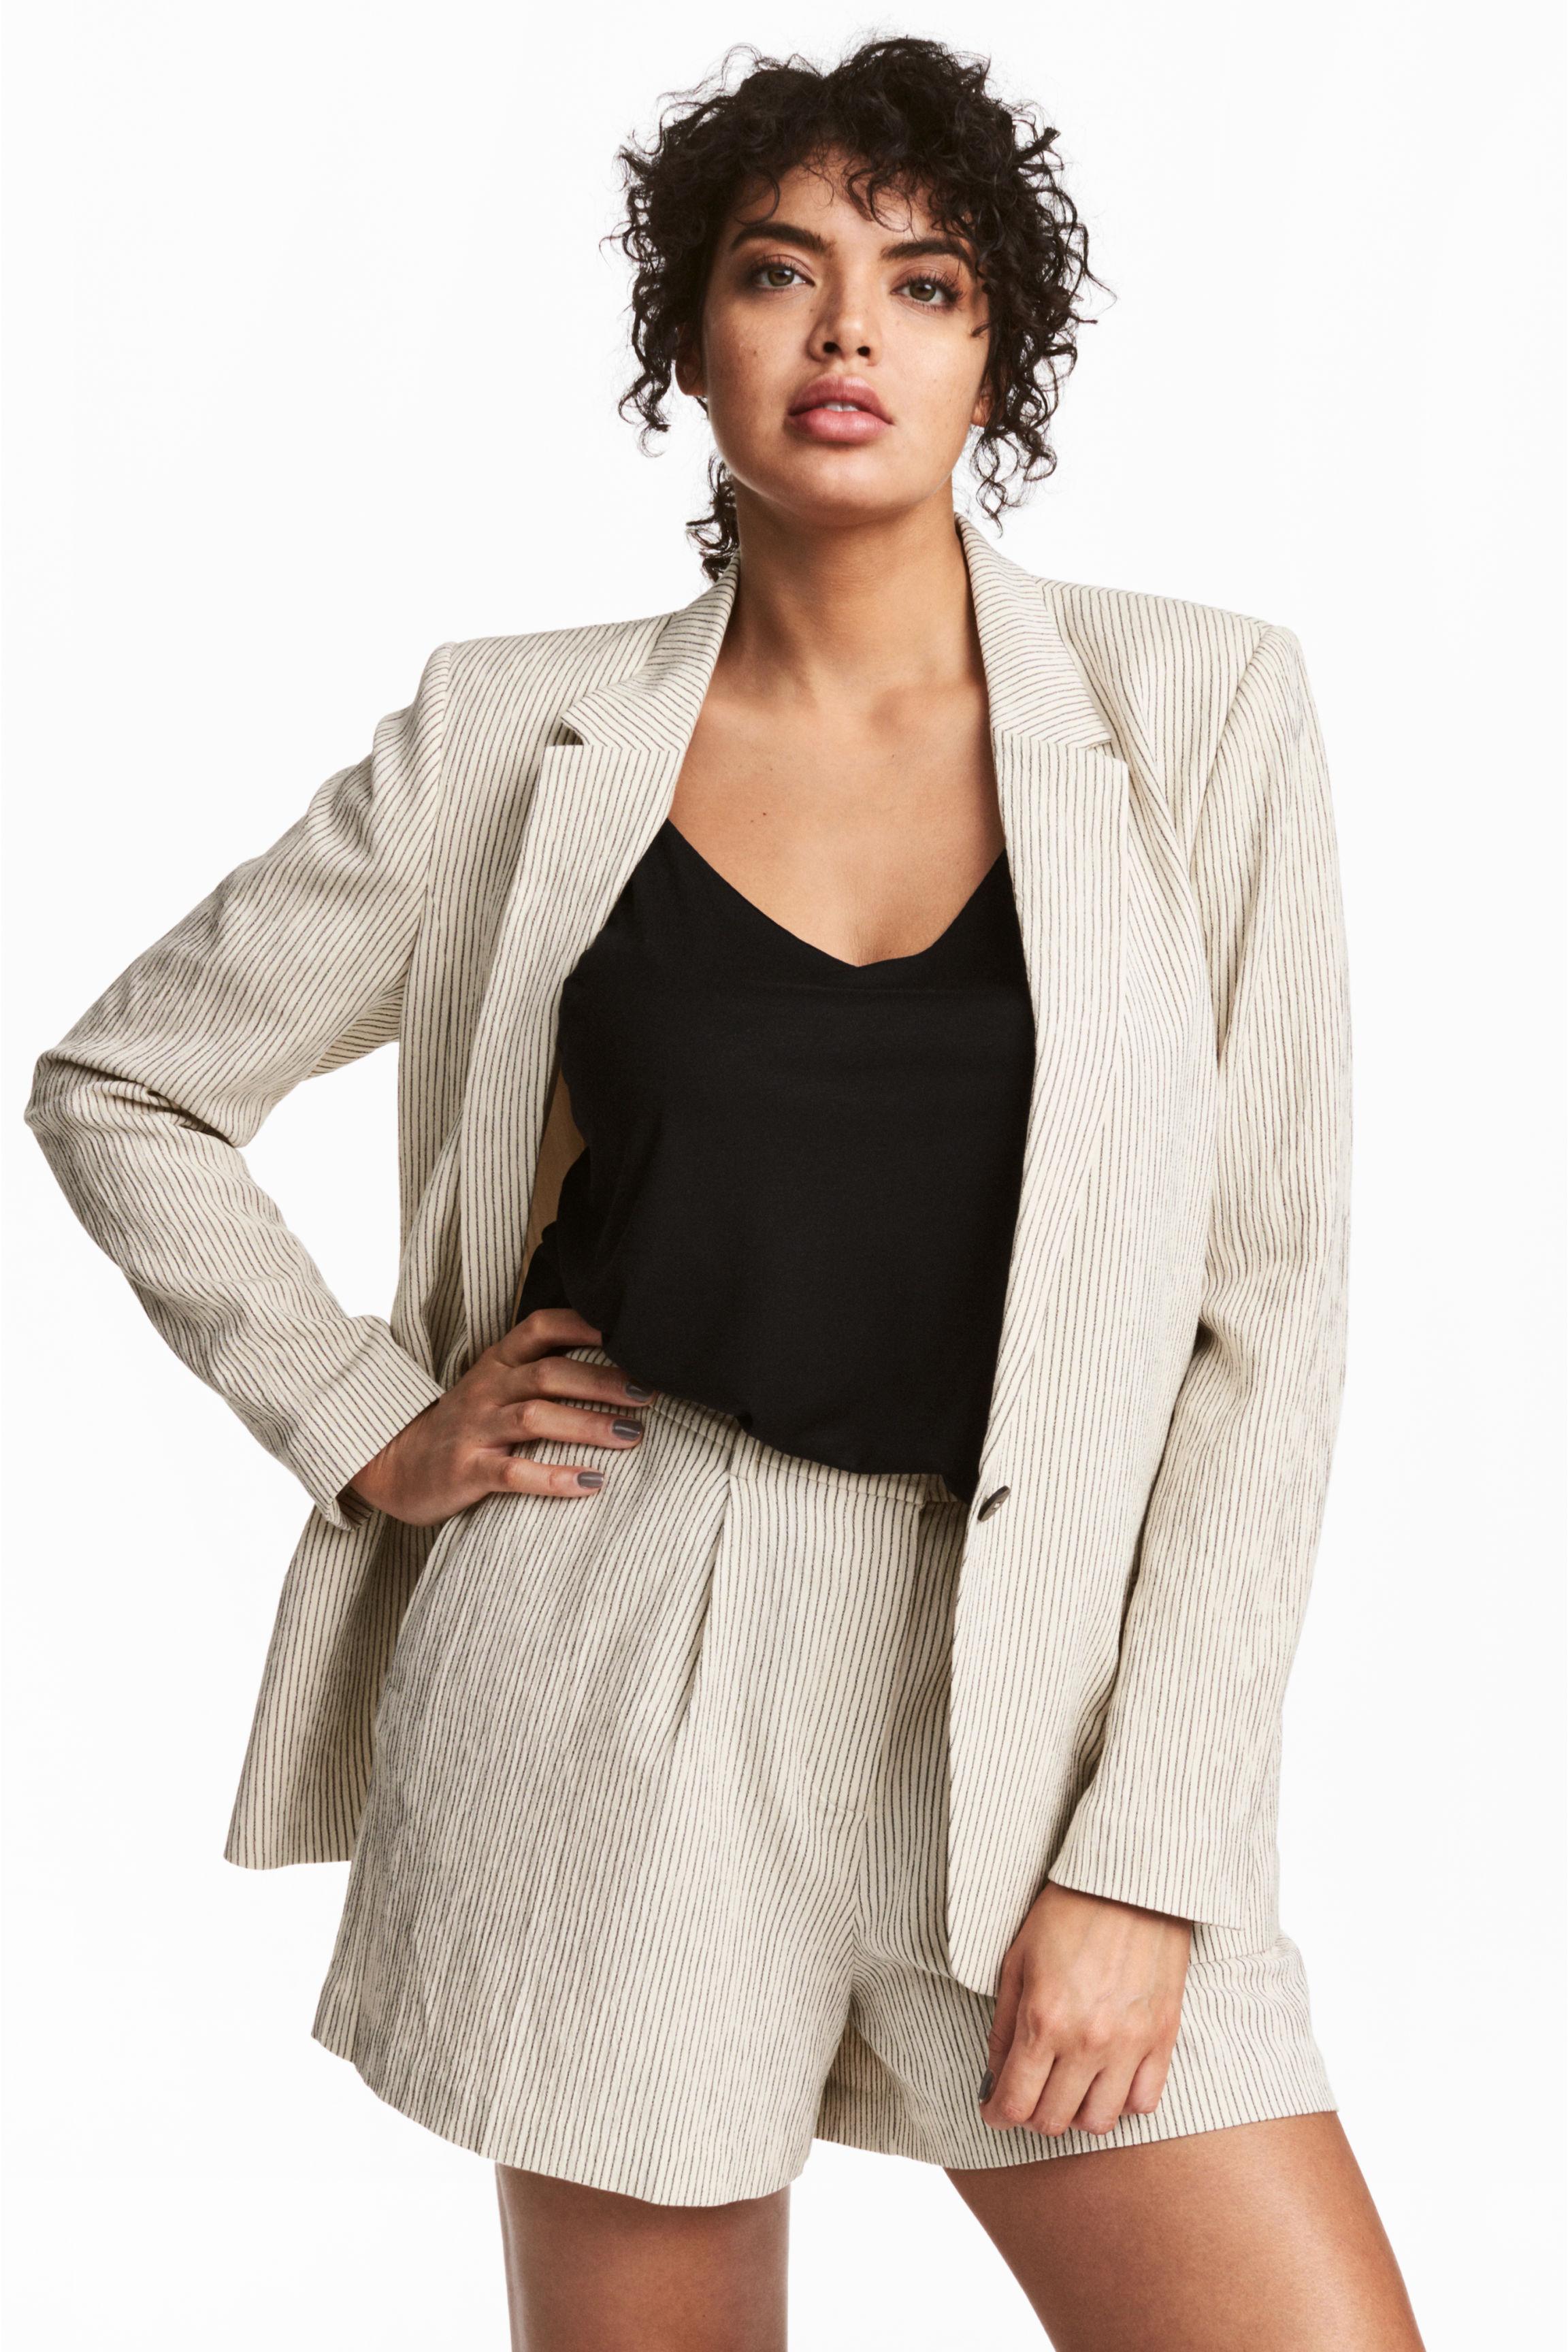 H&M+ Blazer à rayures tennis - Écru/rayé - FEMME | H&M FR 1